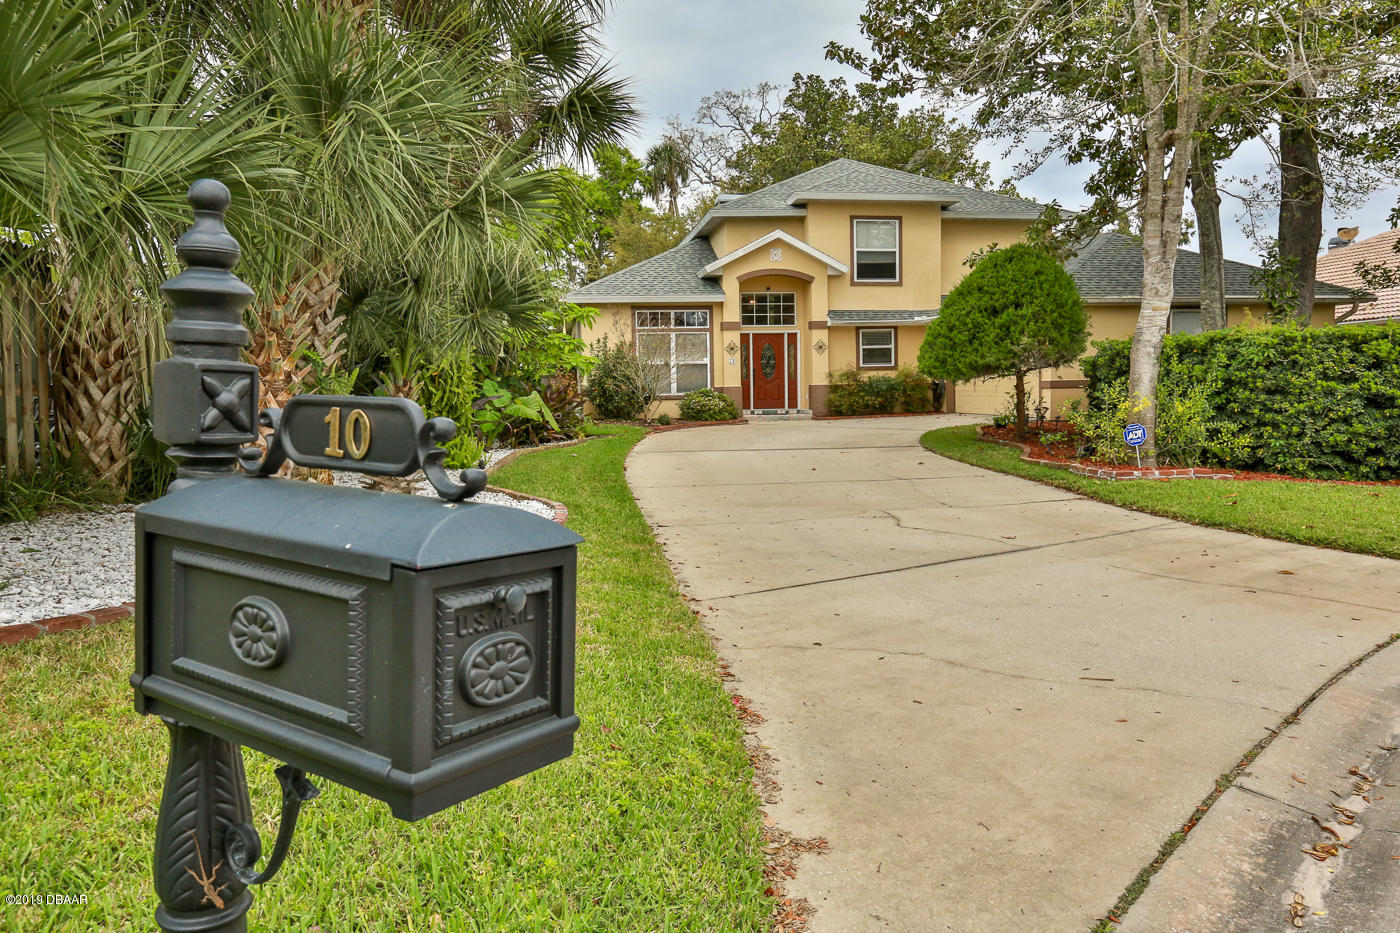 10 N Ravensfield Lane, Ormond Beach, Florida